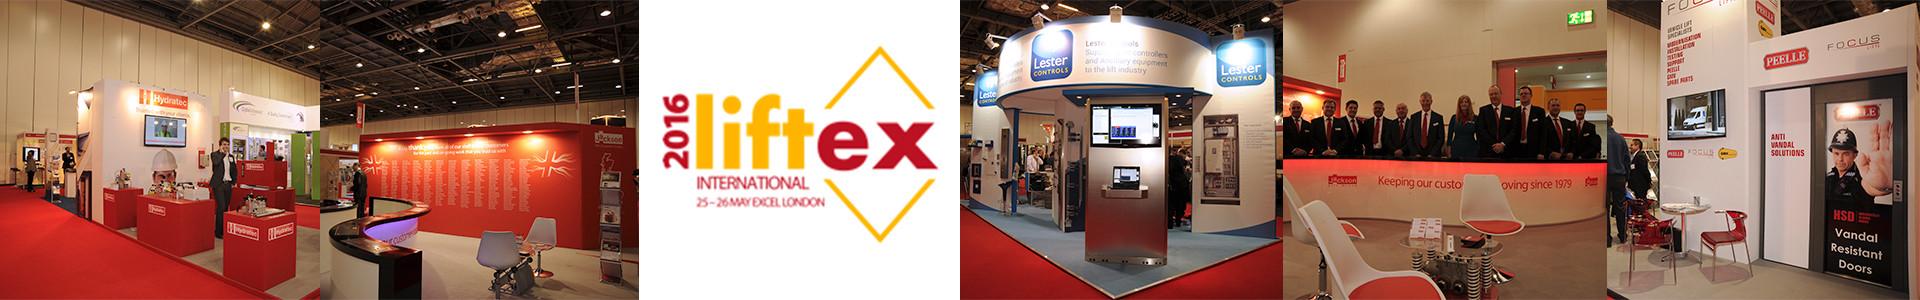 liftex 2016 stands